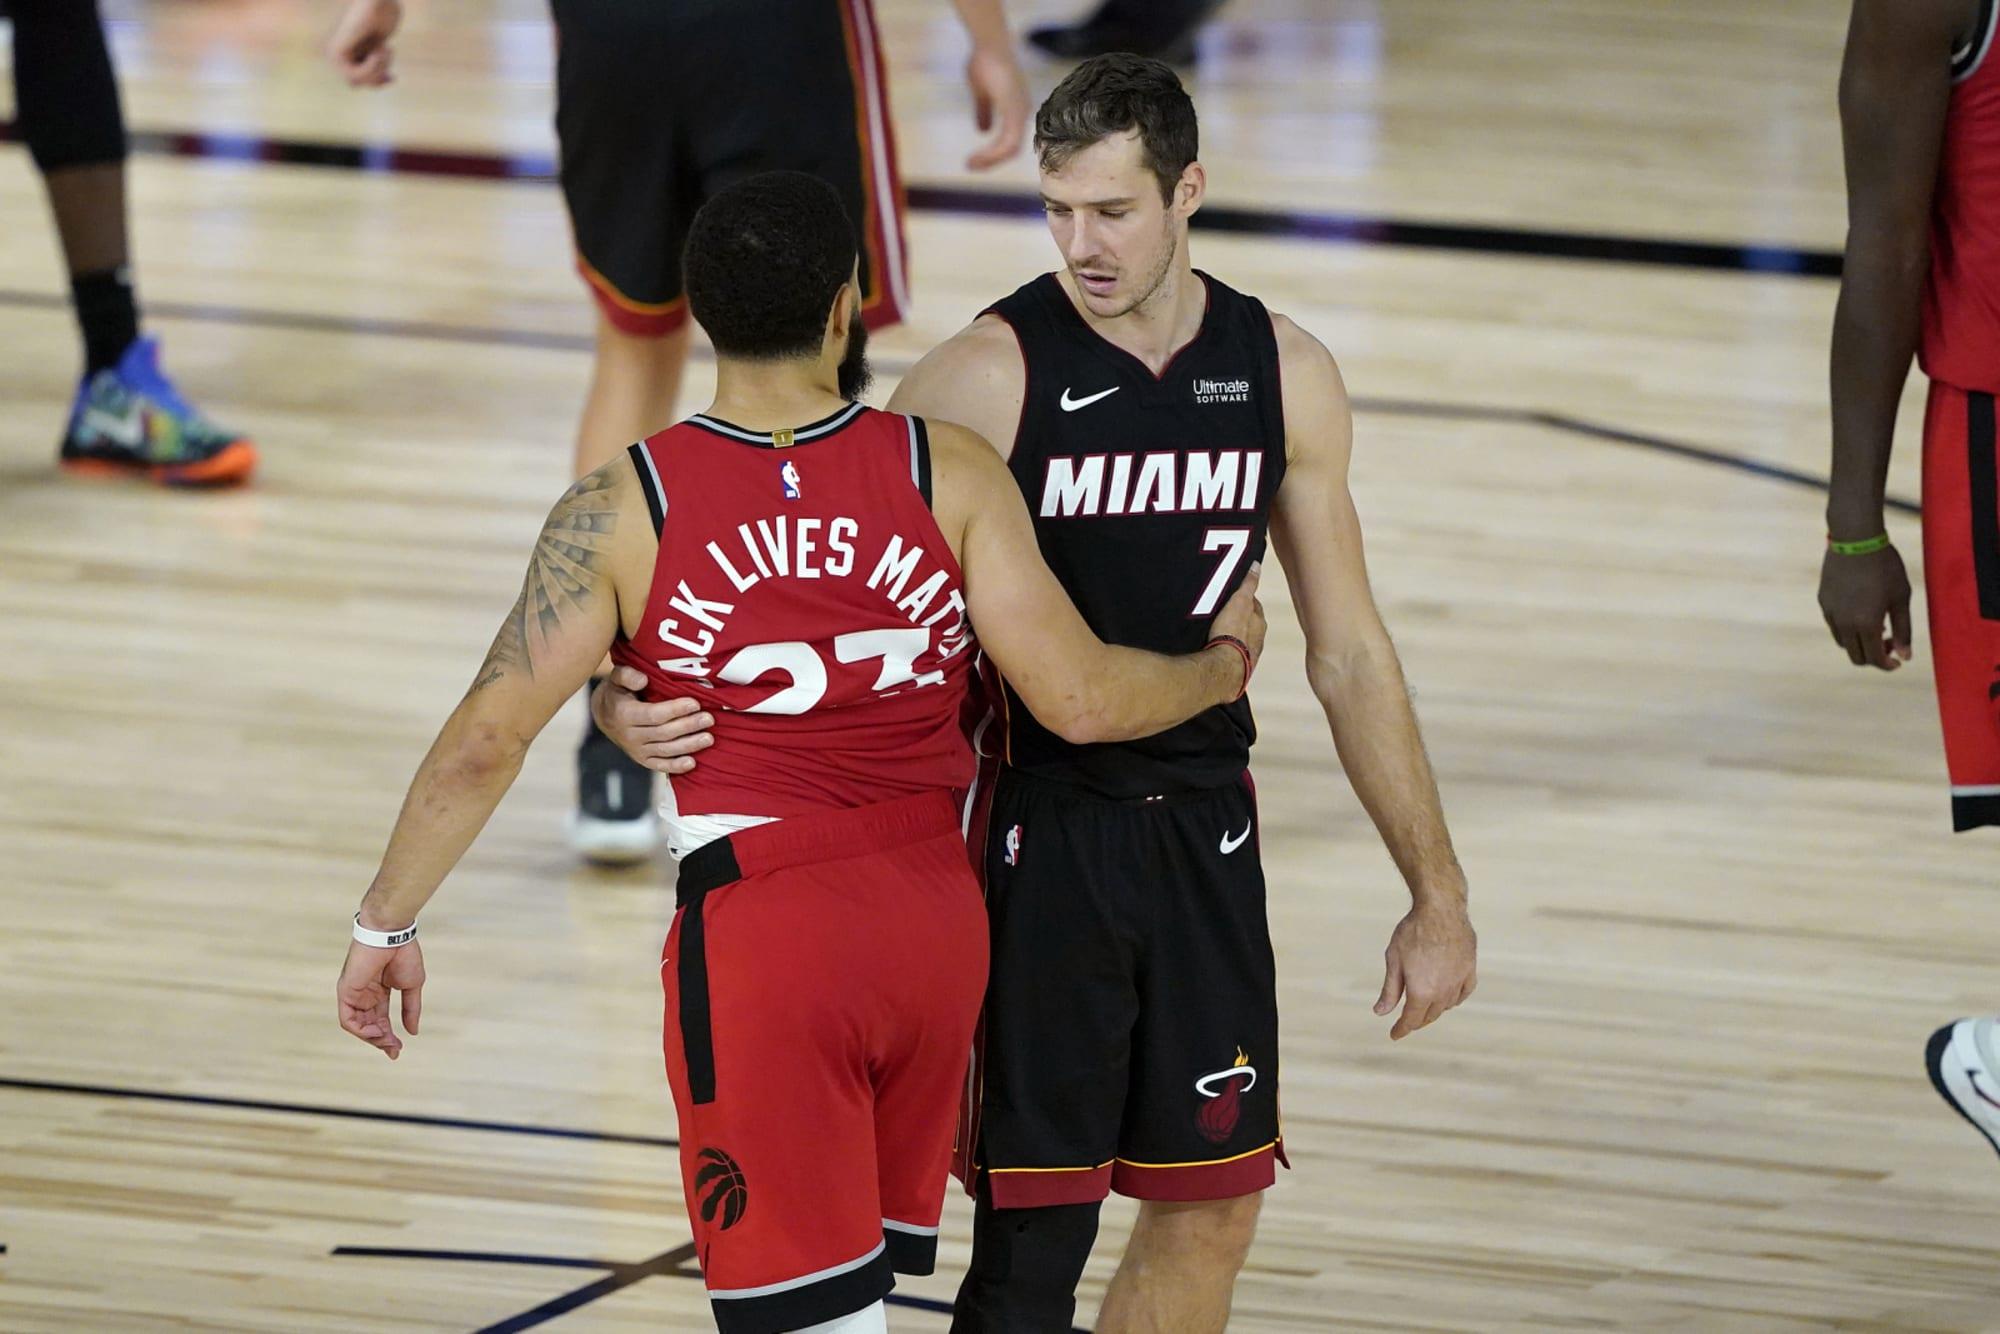 Three key takeaways from the Toronto Raptors loss to the Heat